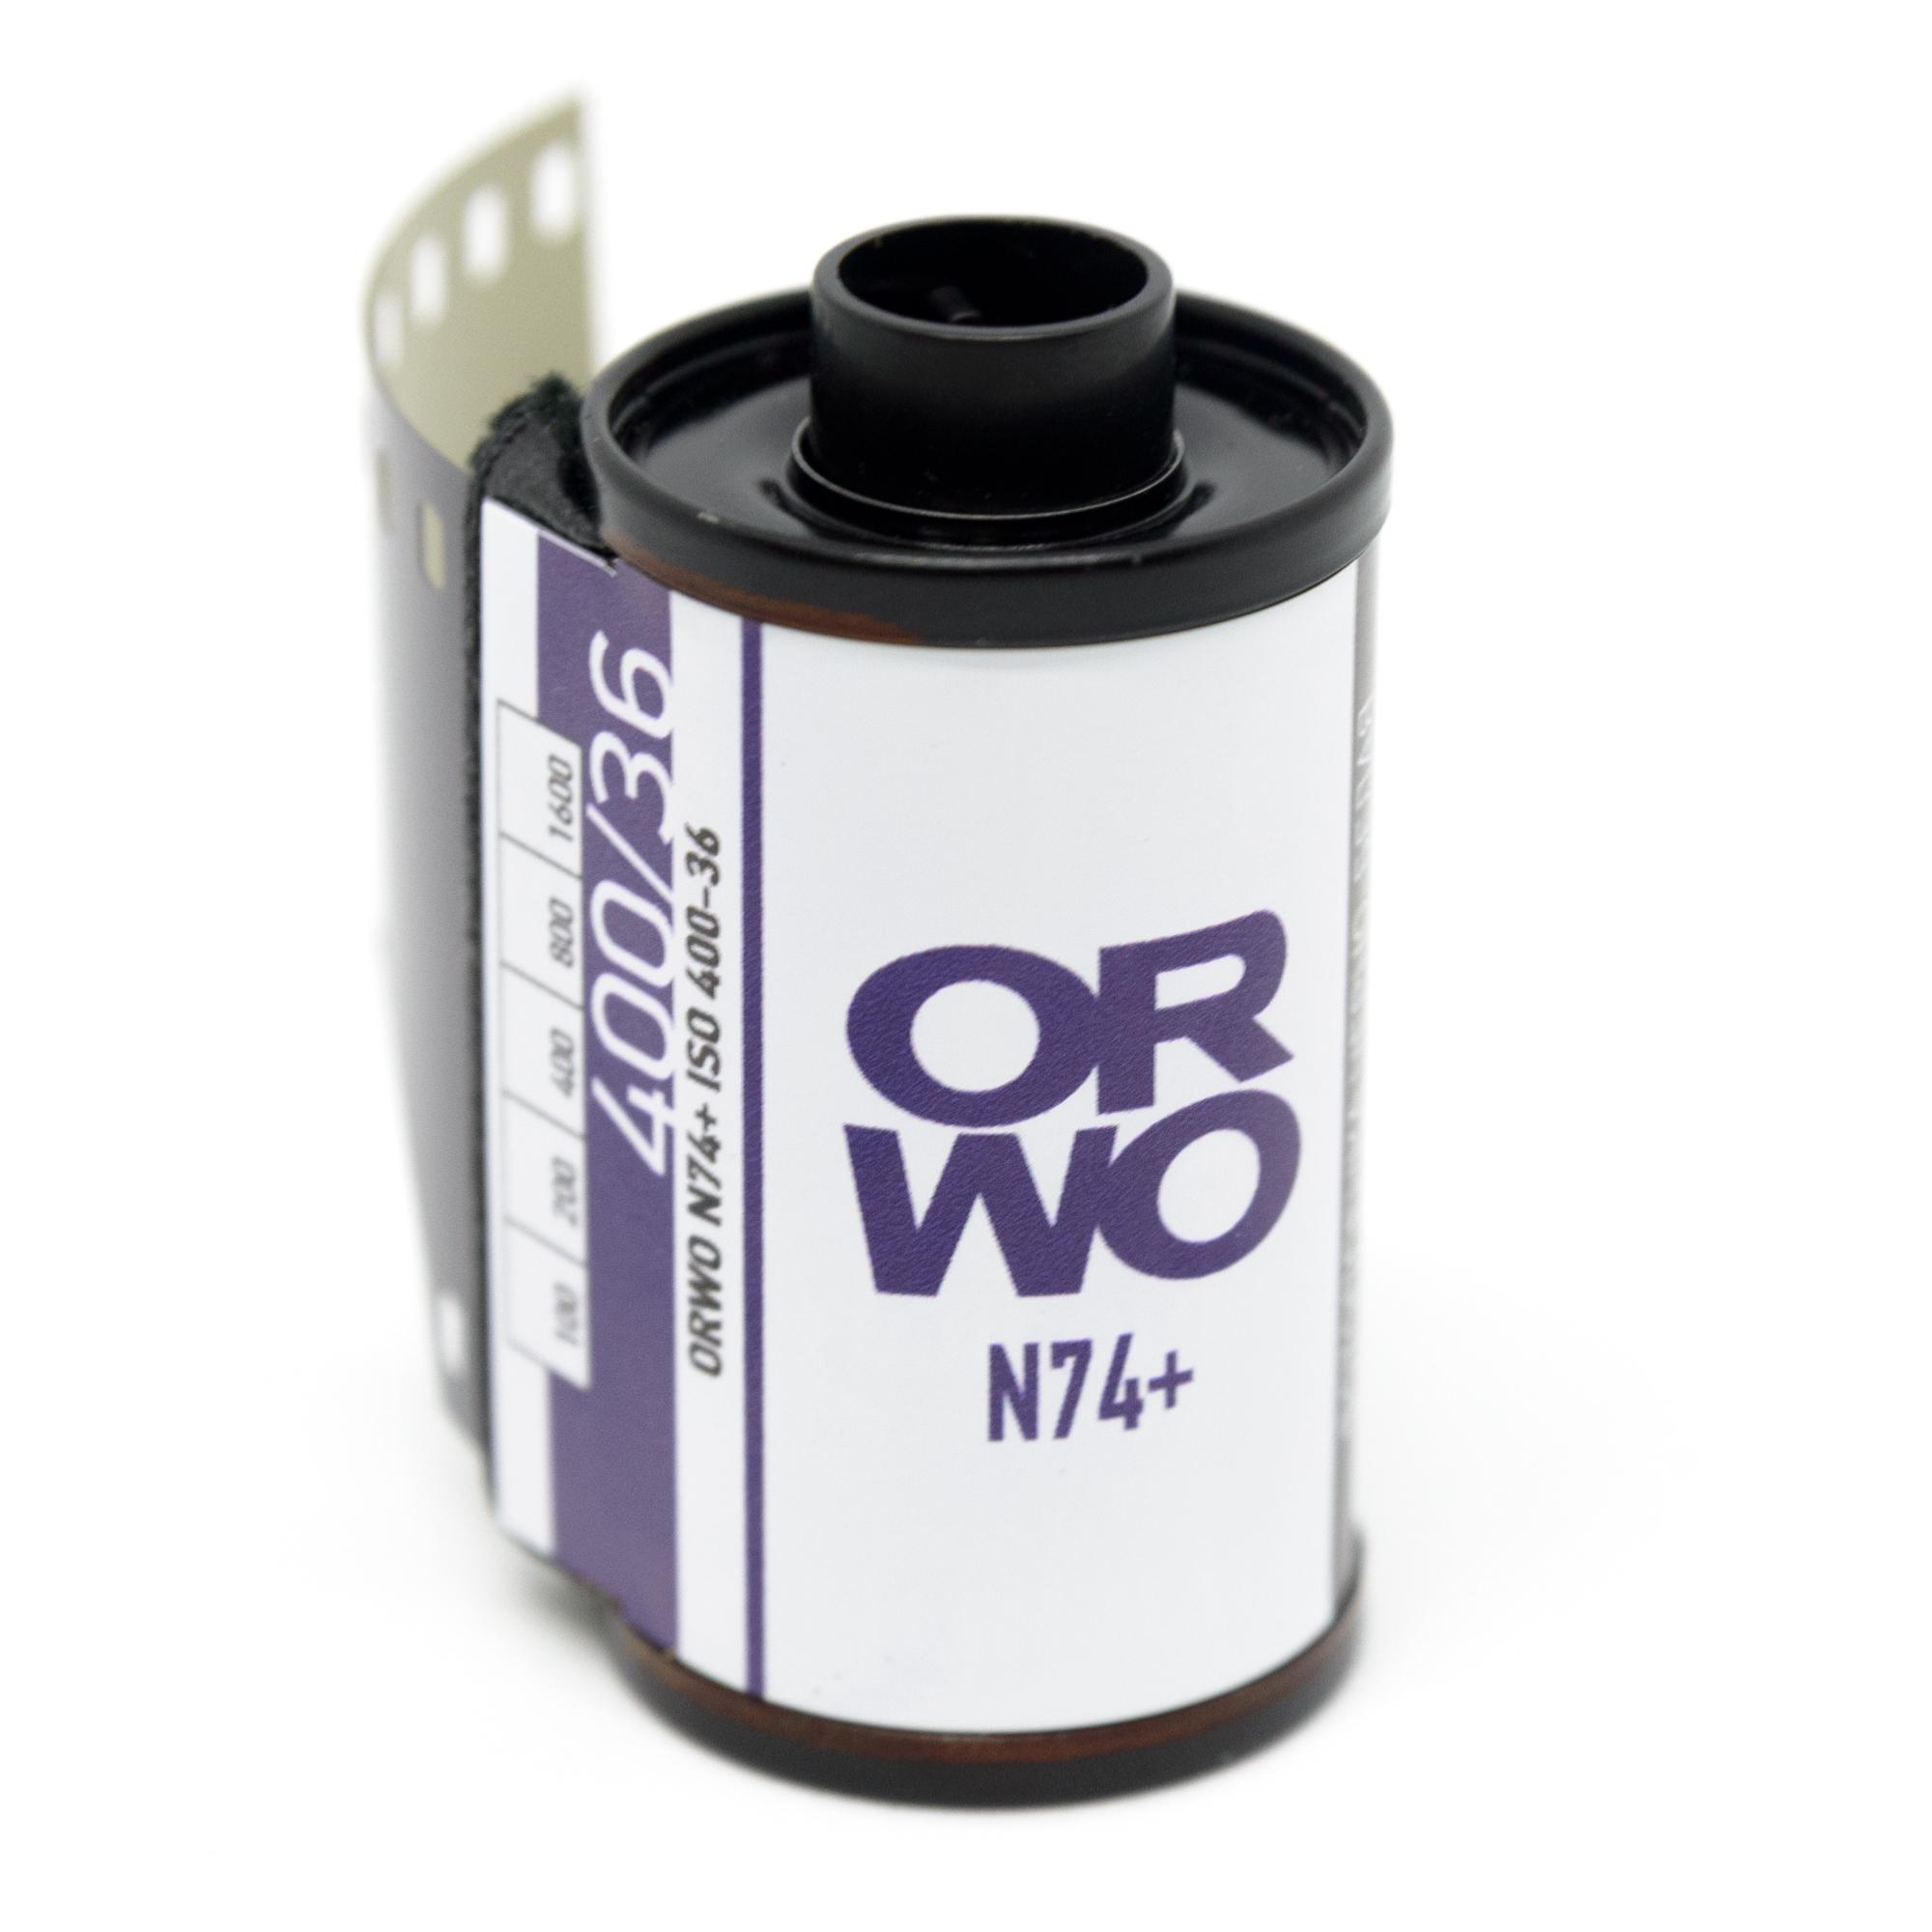 Фотопленка ORWO N74+ ISO400 135/36